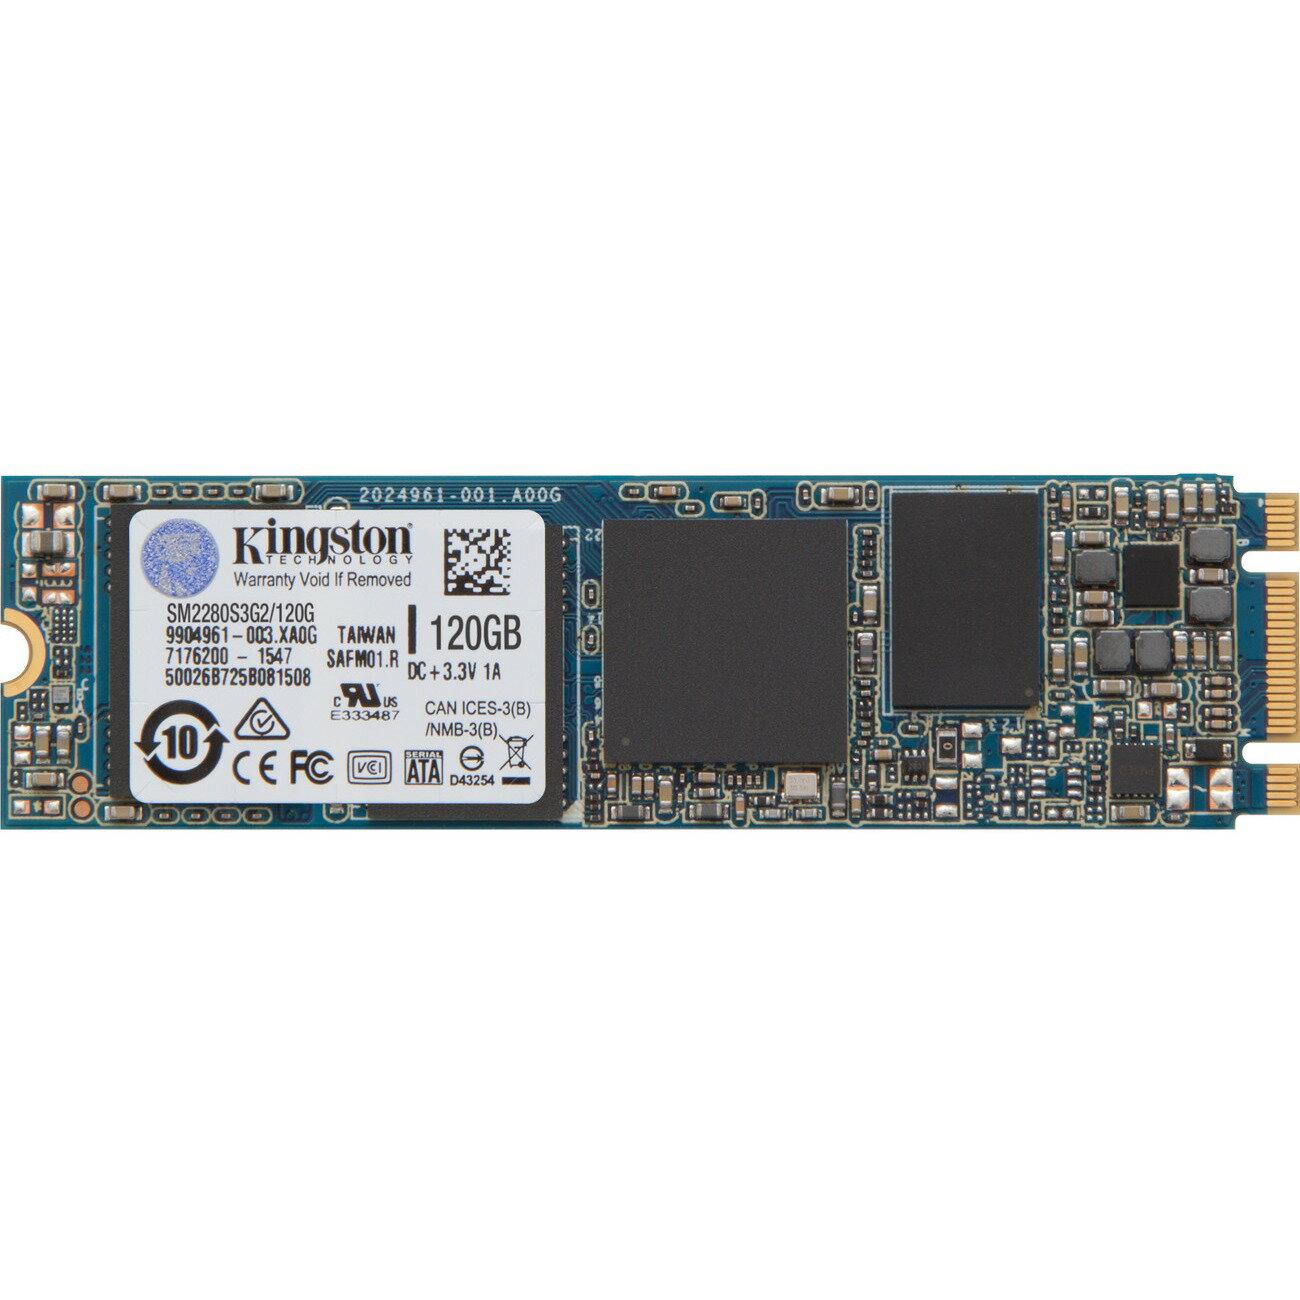 Kingston SSD M.2 2280 120GB SSDNow SATA III G2 Internal Solid State Drive SM2280S3G2/120G 0